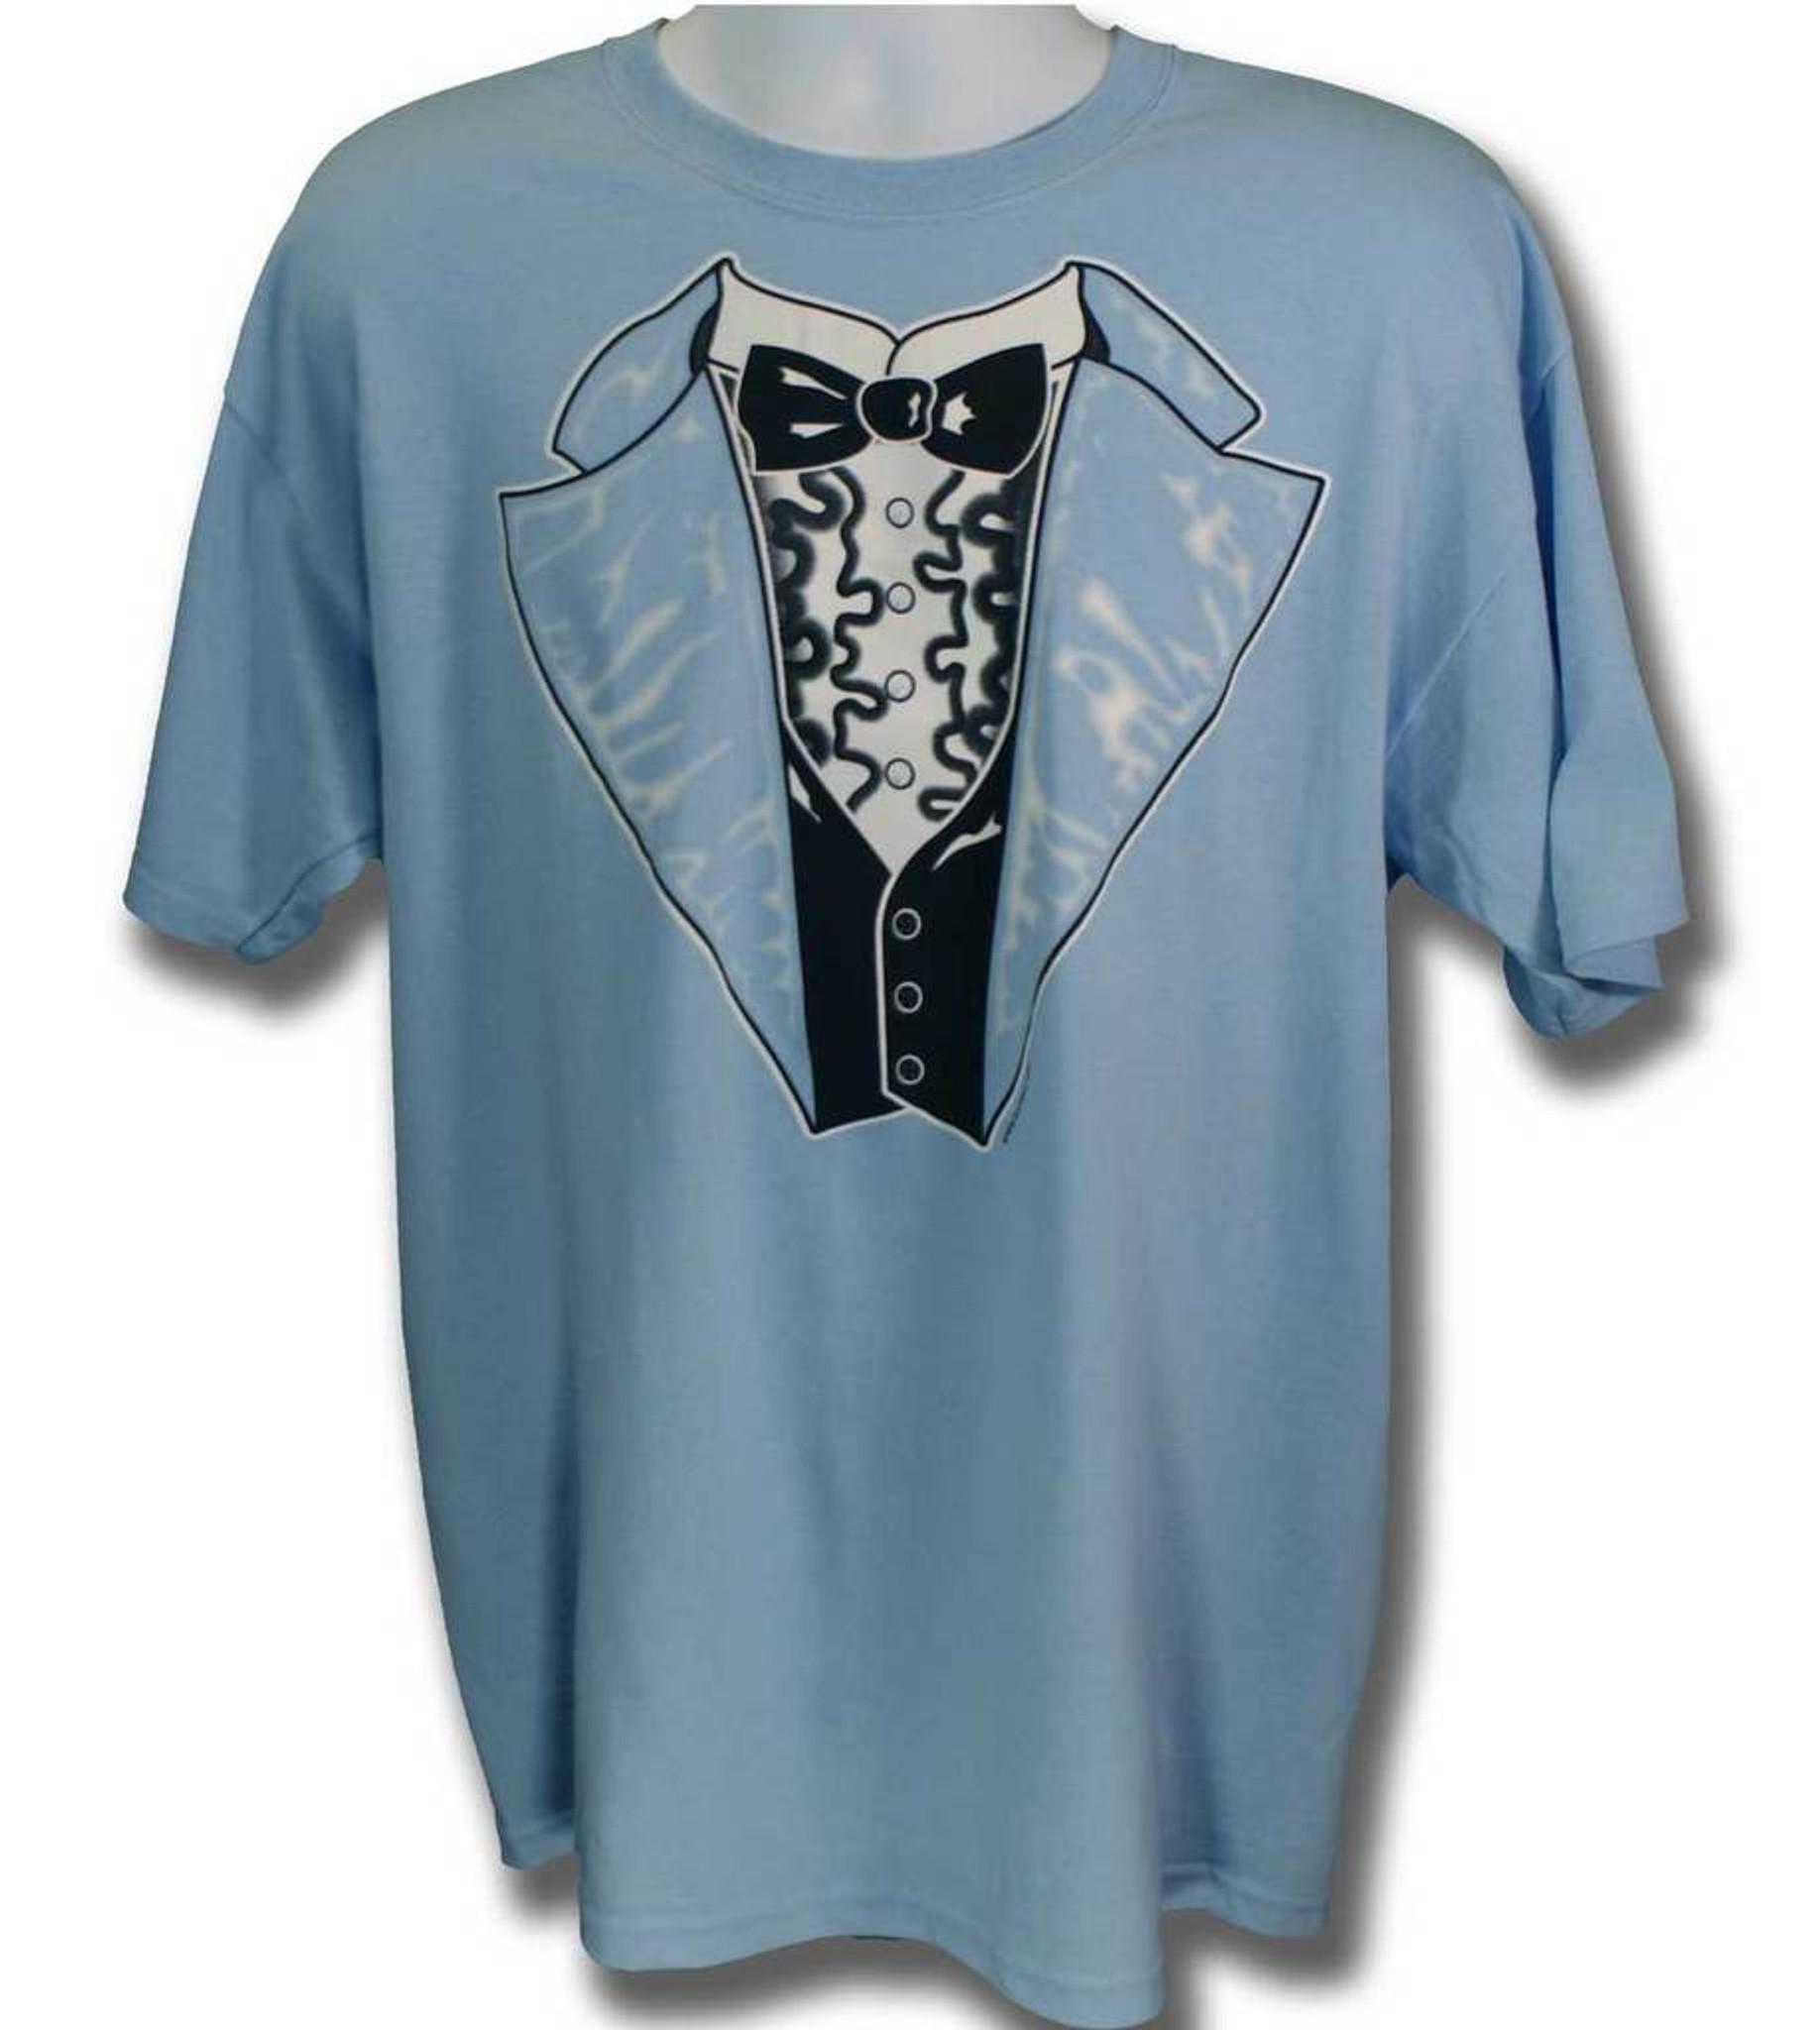 Retro Tuxedo T-shirt in Blue